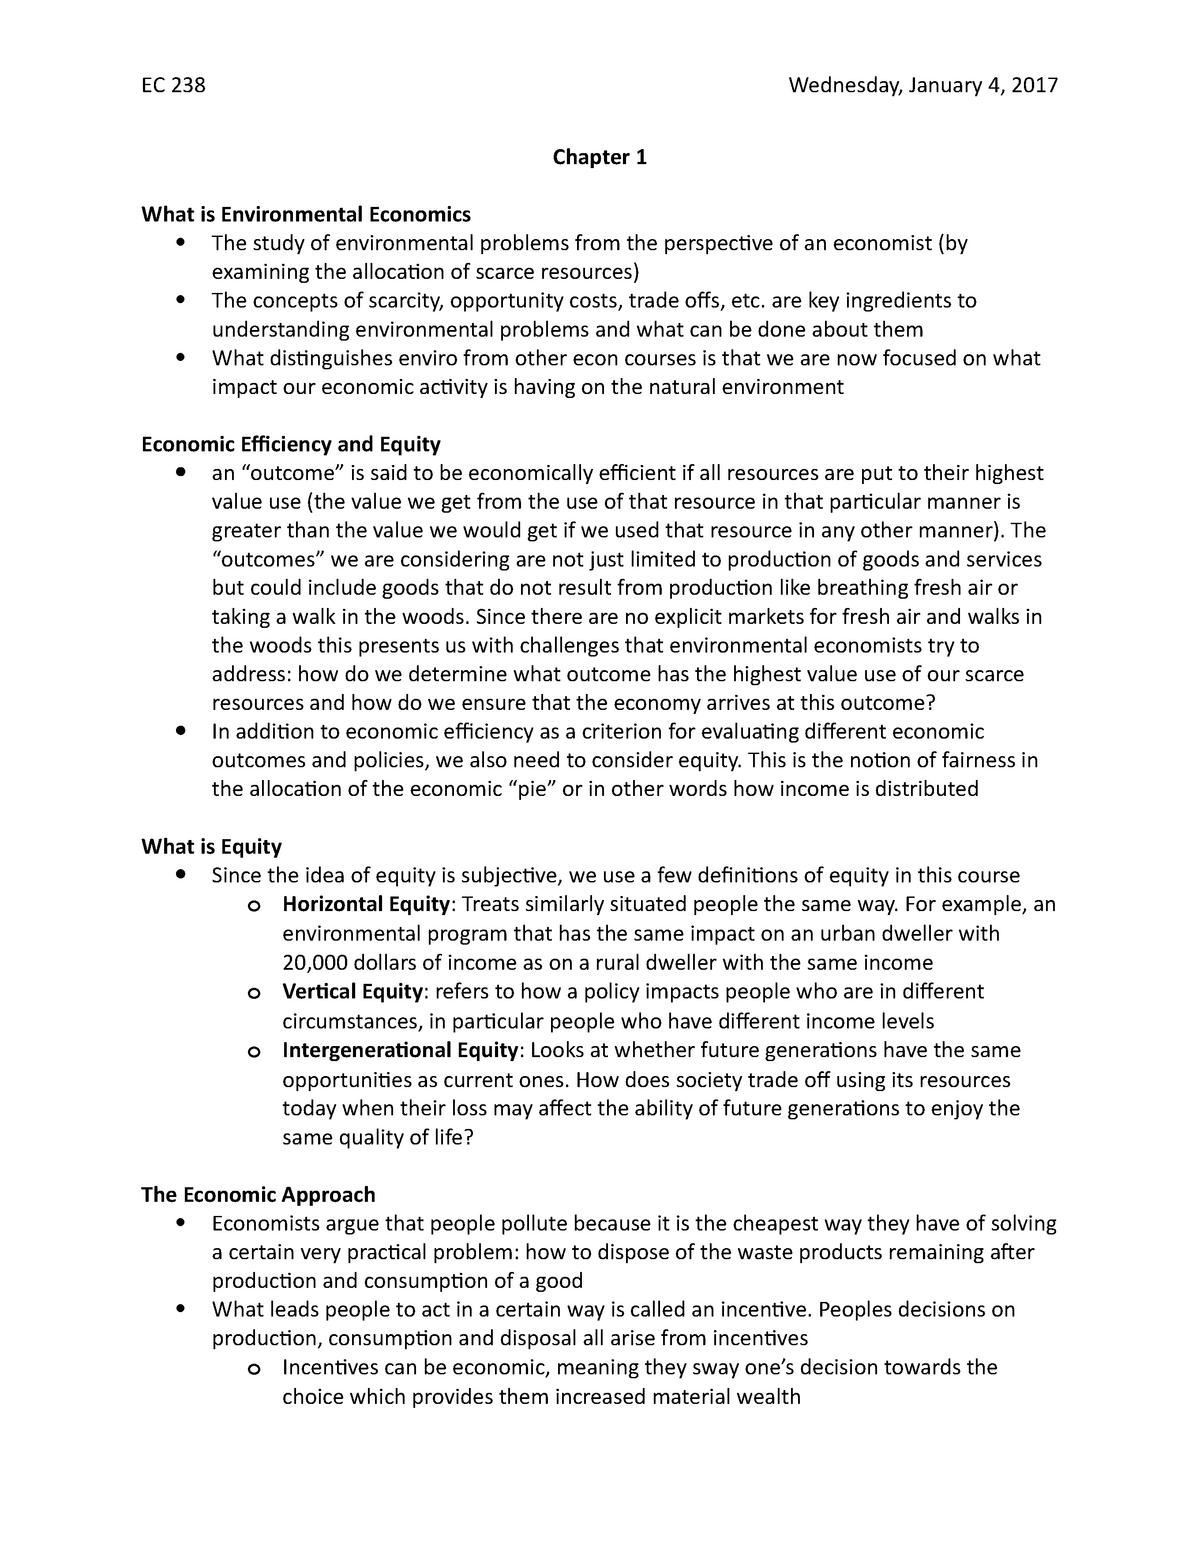 Chapter 1 Notes - EC238: Environmental Economics - StuDocu